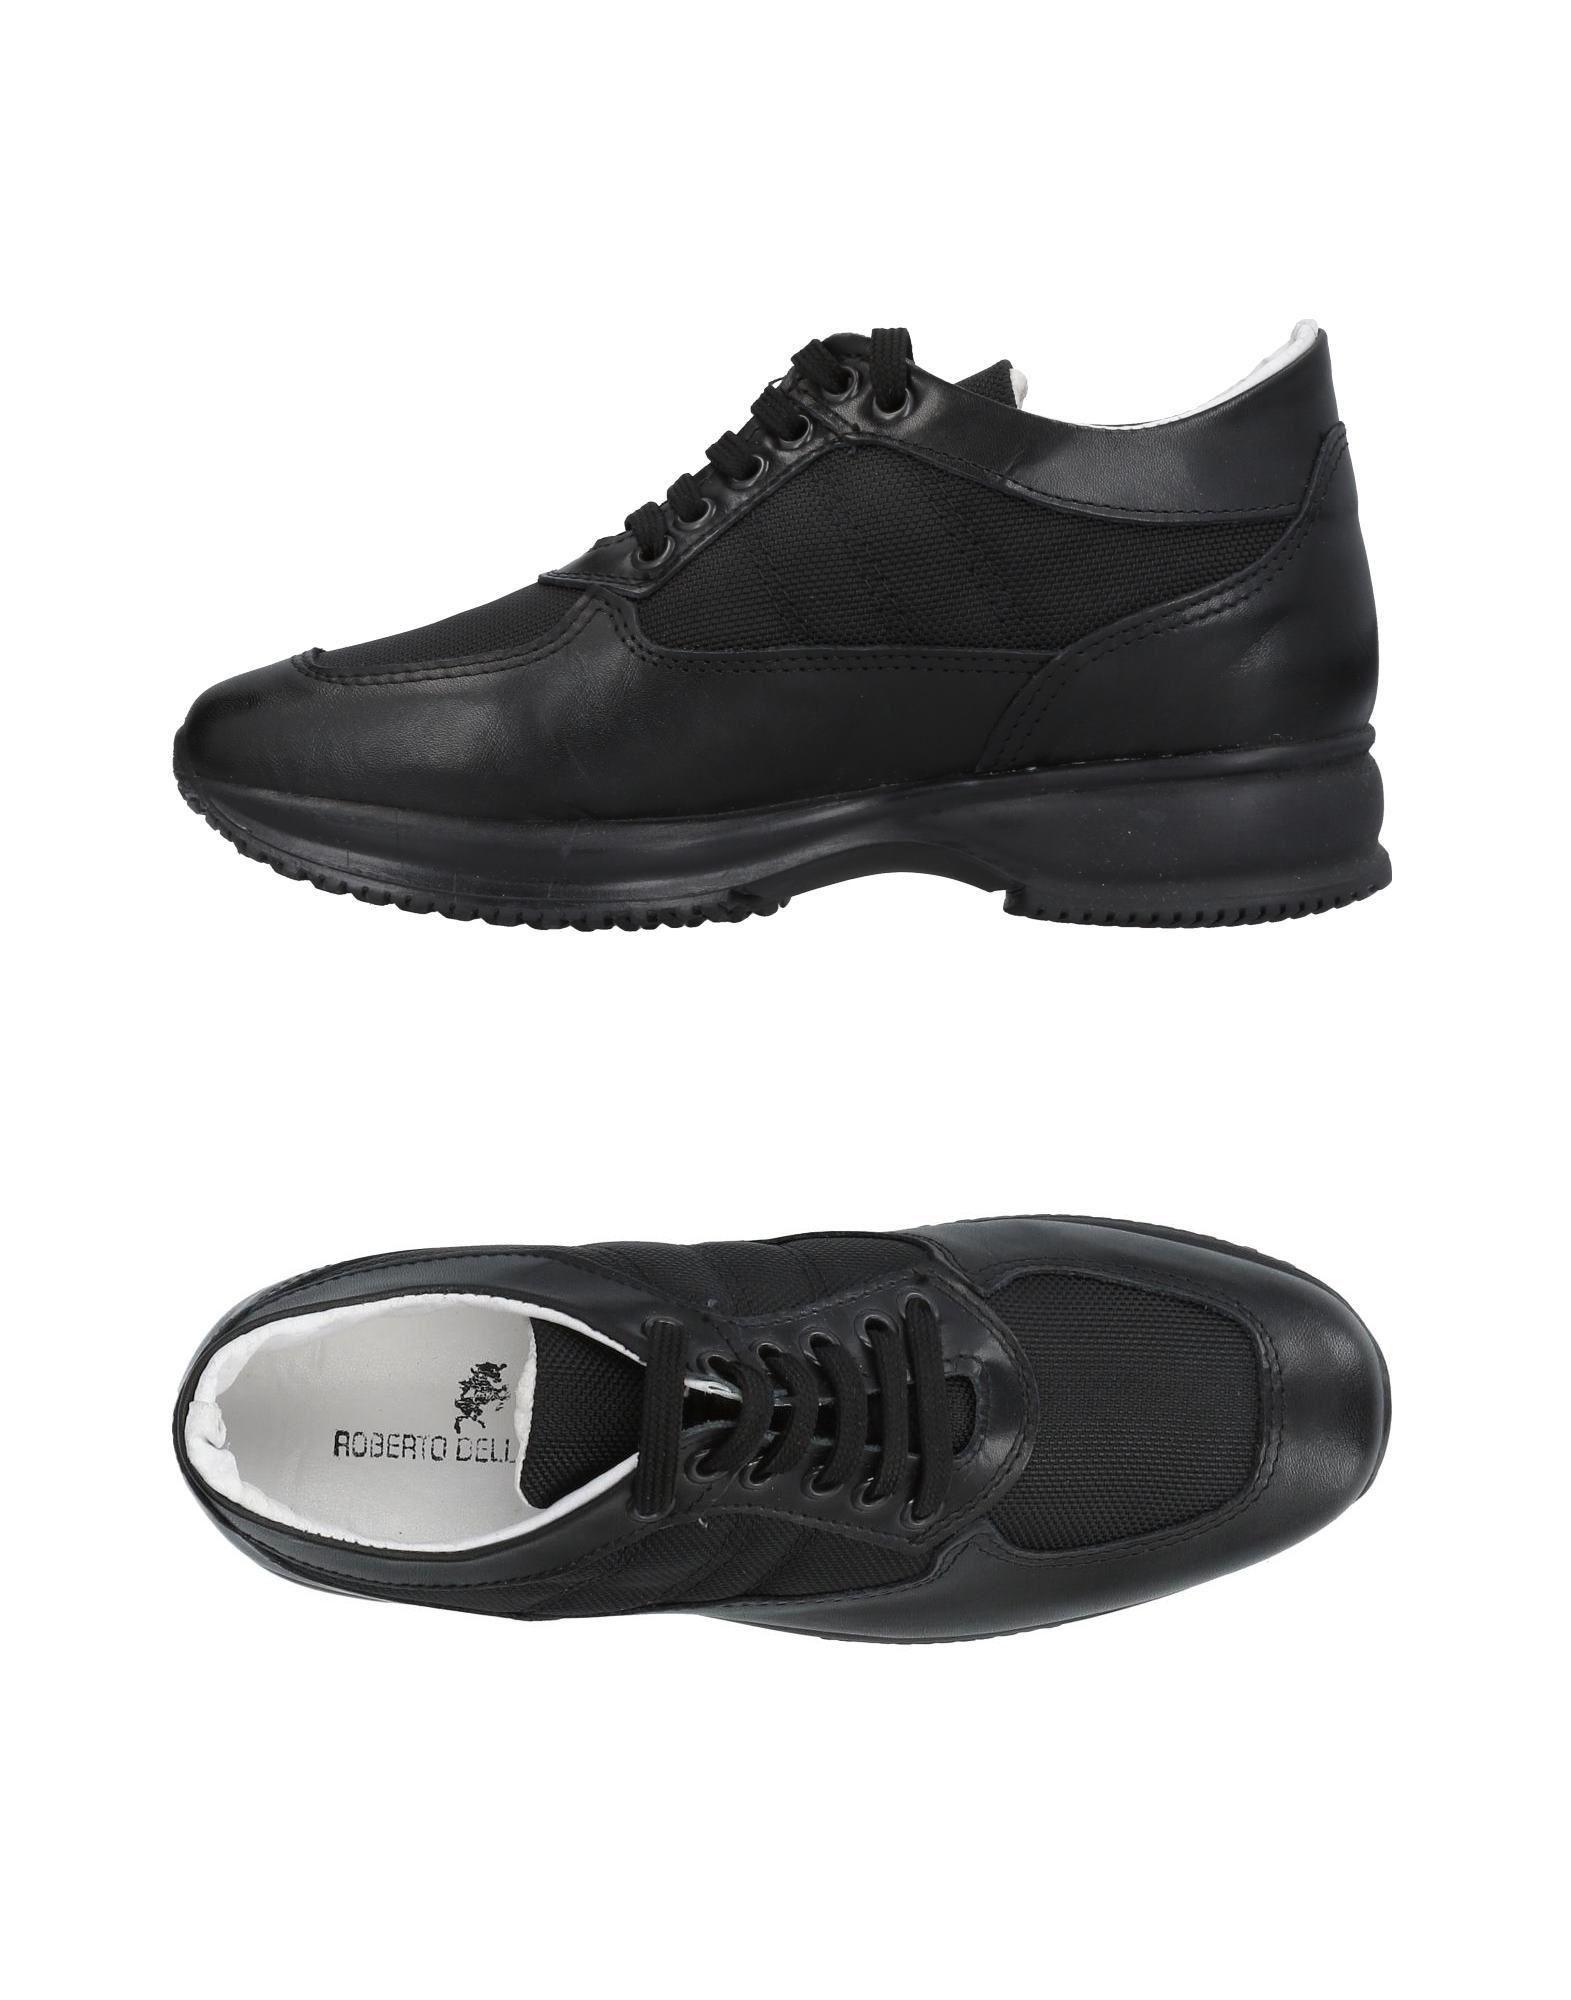 Roberto Della Croce Sneakers - Sneakers Women Roberto Della Croce Sneakers - online on  Australia - 11460497DM 0a8311